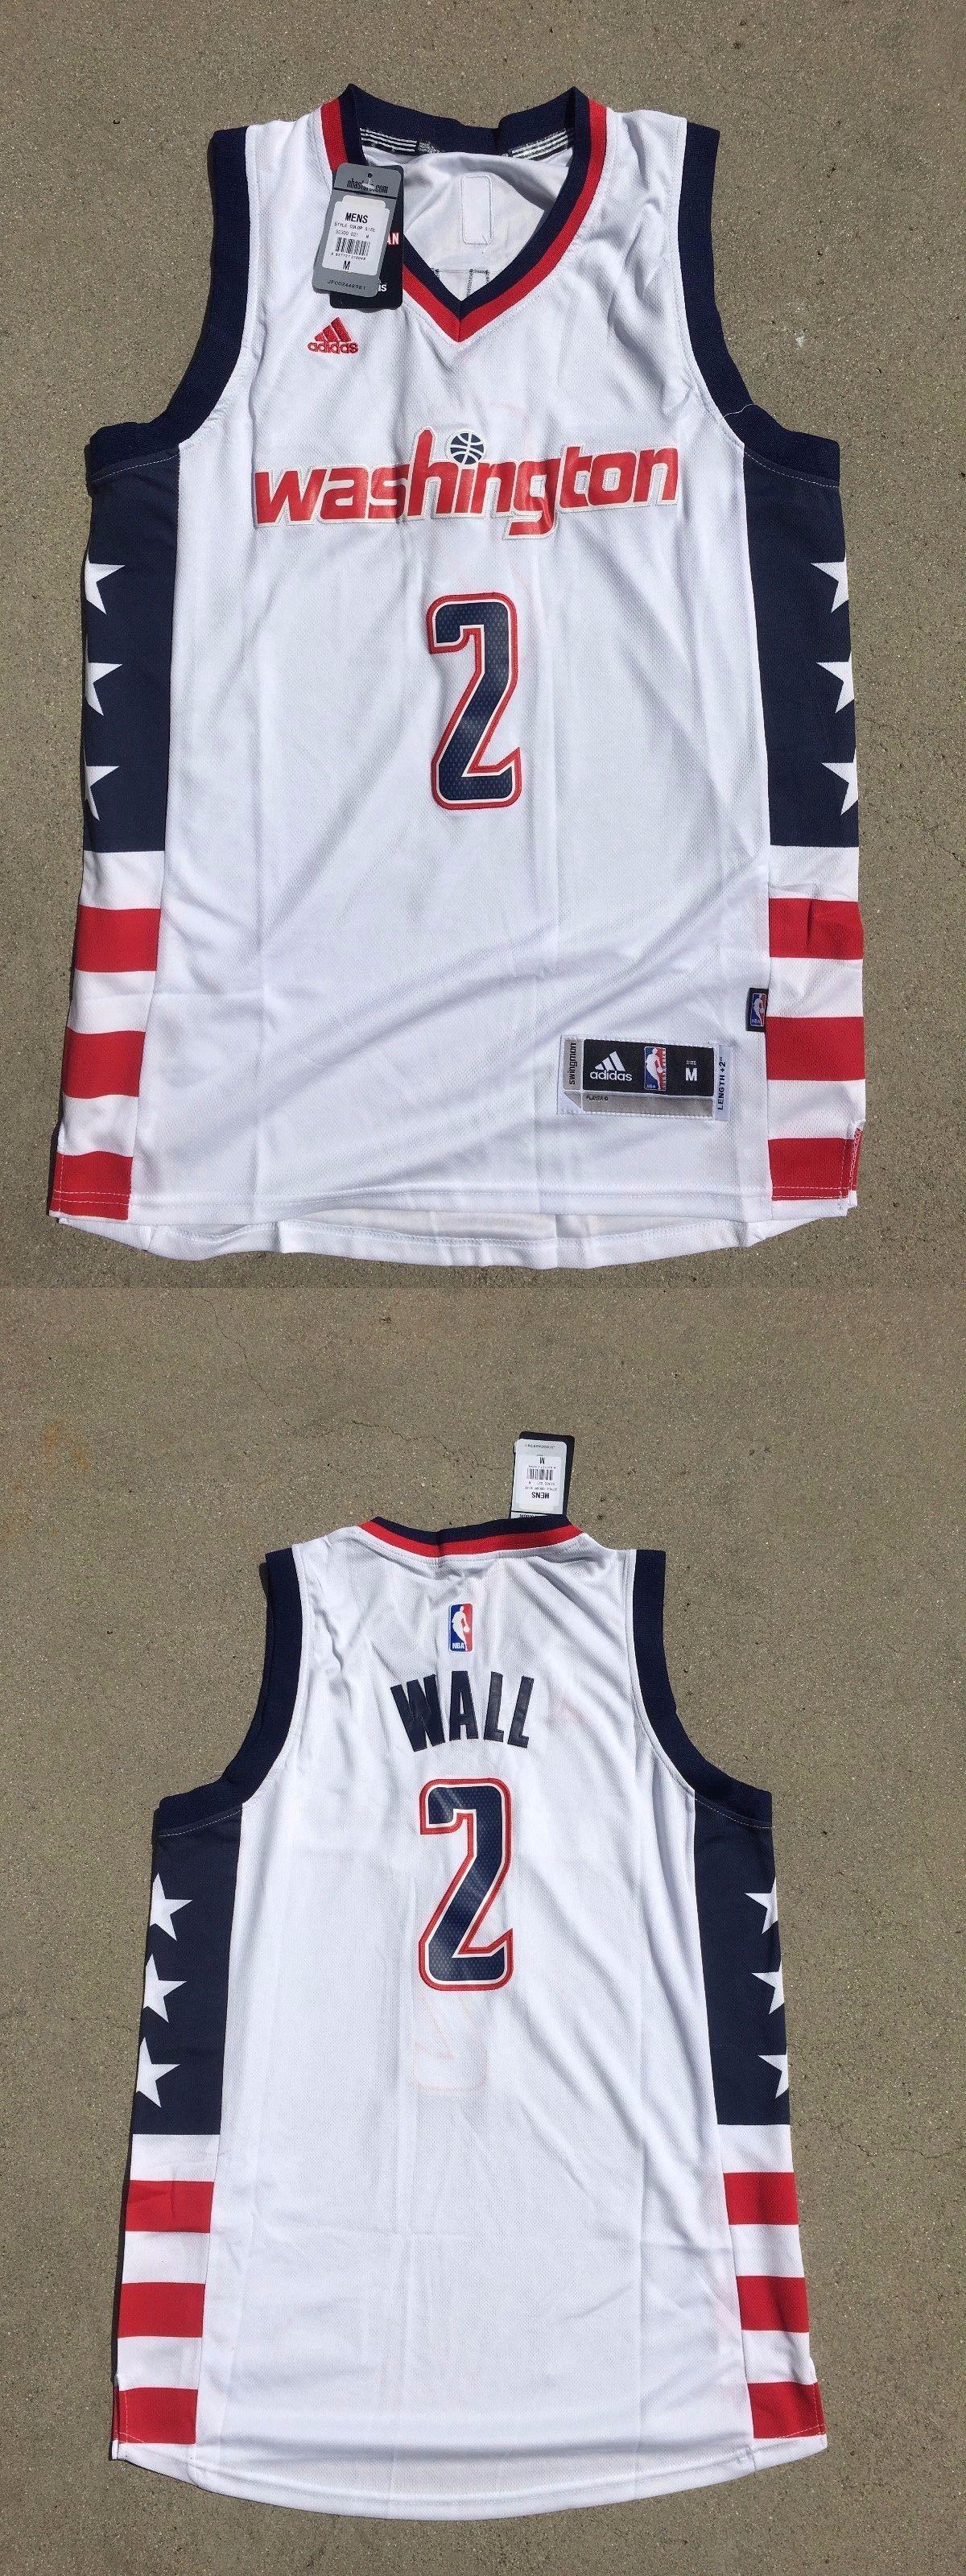 premium selection 33558 cc326 greece john wall jersey ebay 53162 43ddd